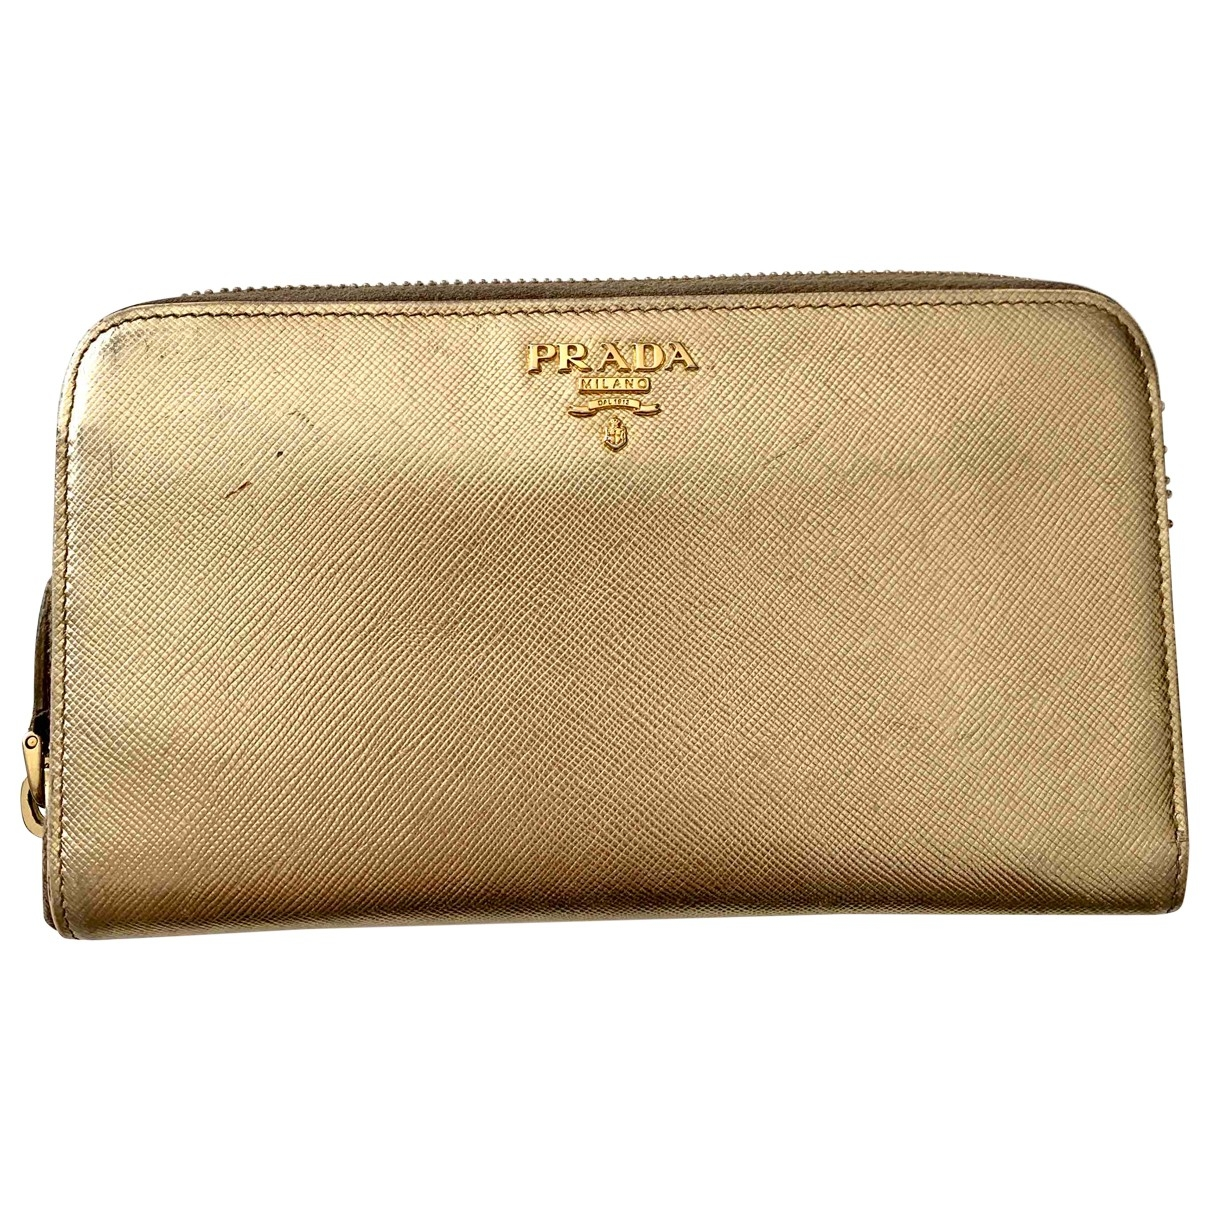 Prada \N Gold Leather wallet for Women \N